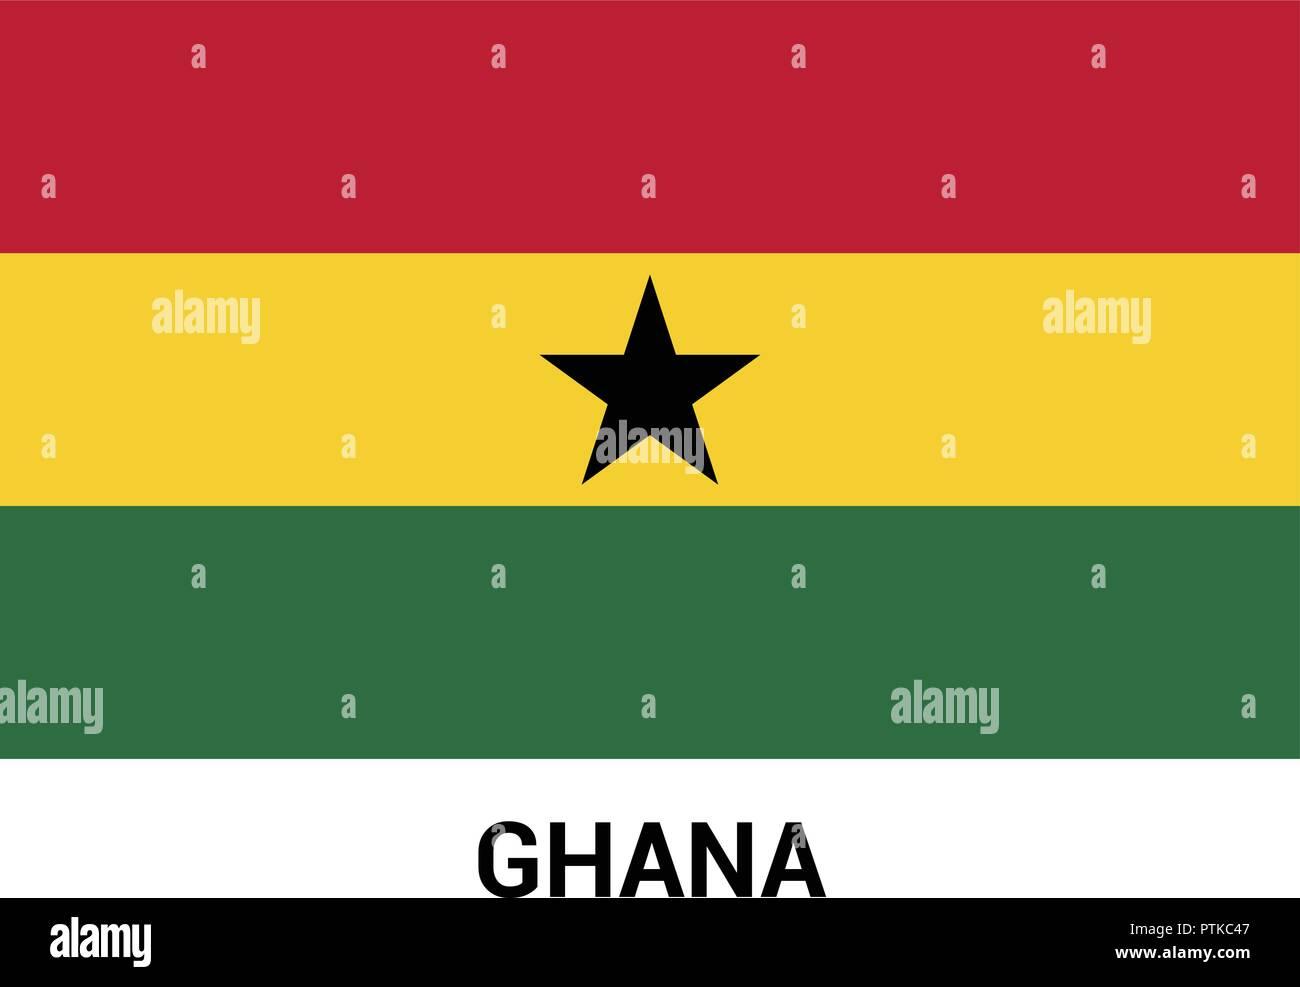 Ghana flag design vector - Stock Vector